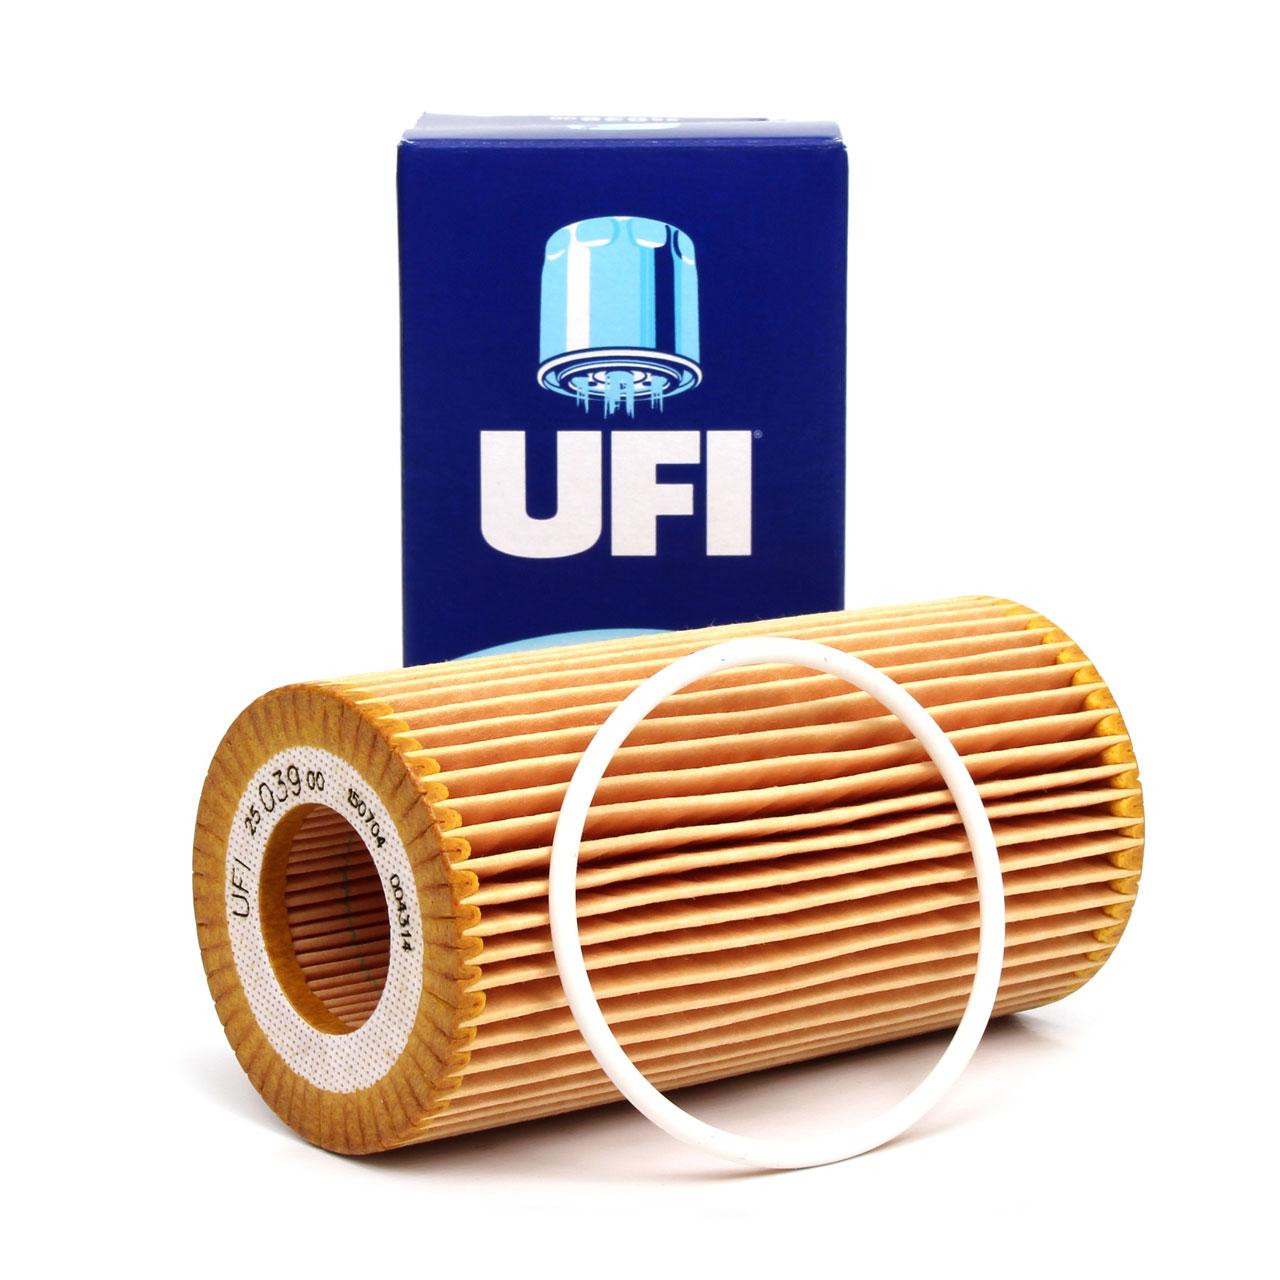 UFI Ölfilter Motorölfilter 25.039.00 für Ford Focus II Kuga I Mondeo IV S-Max